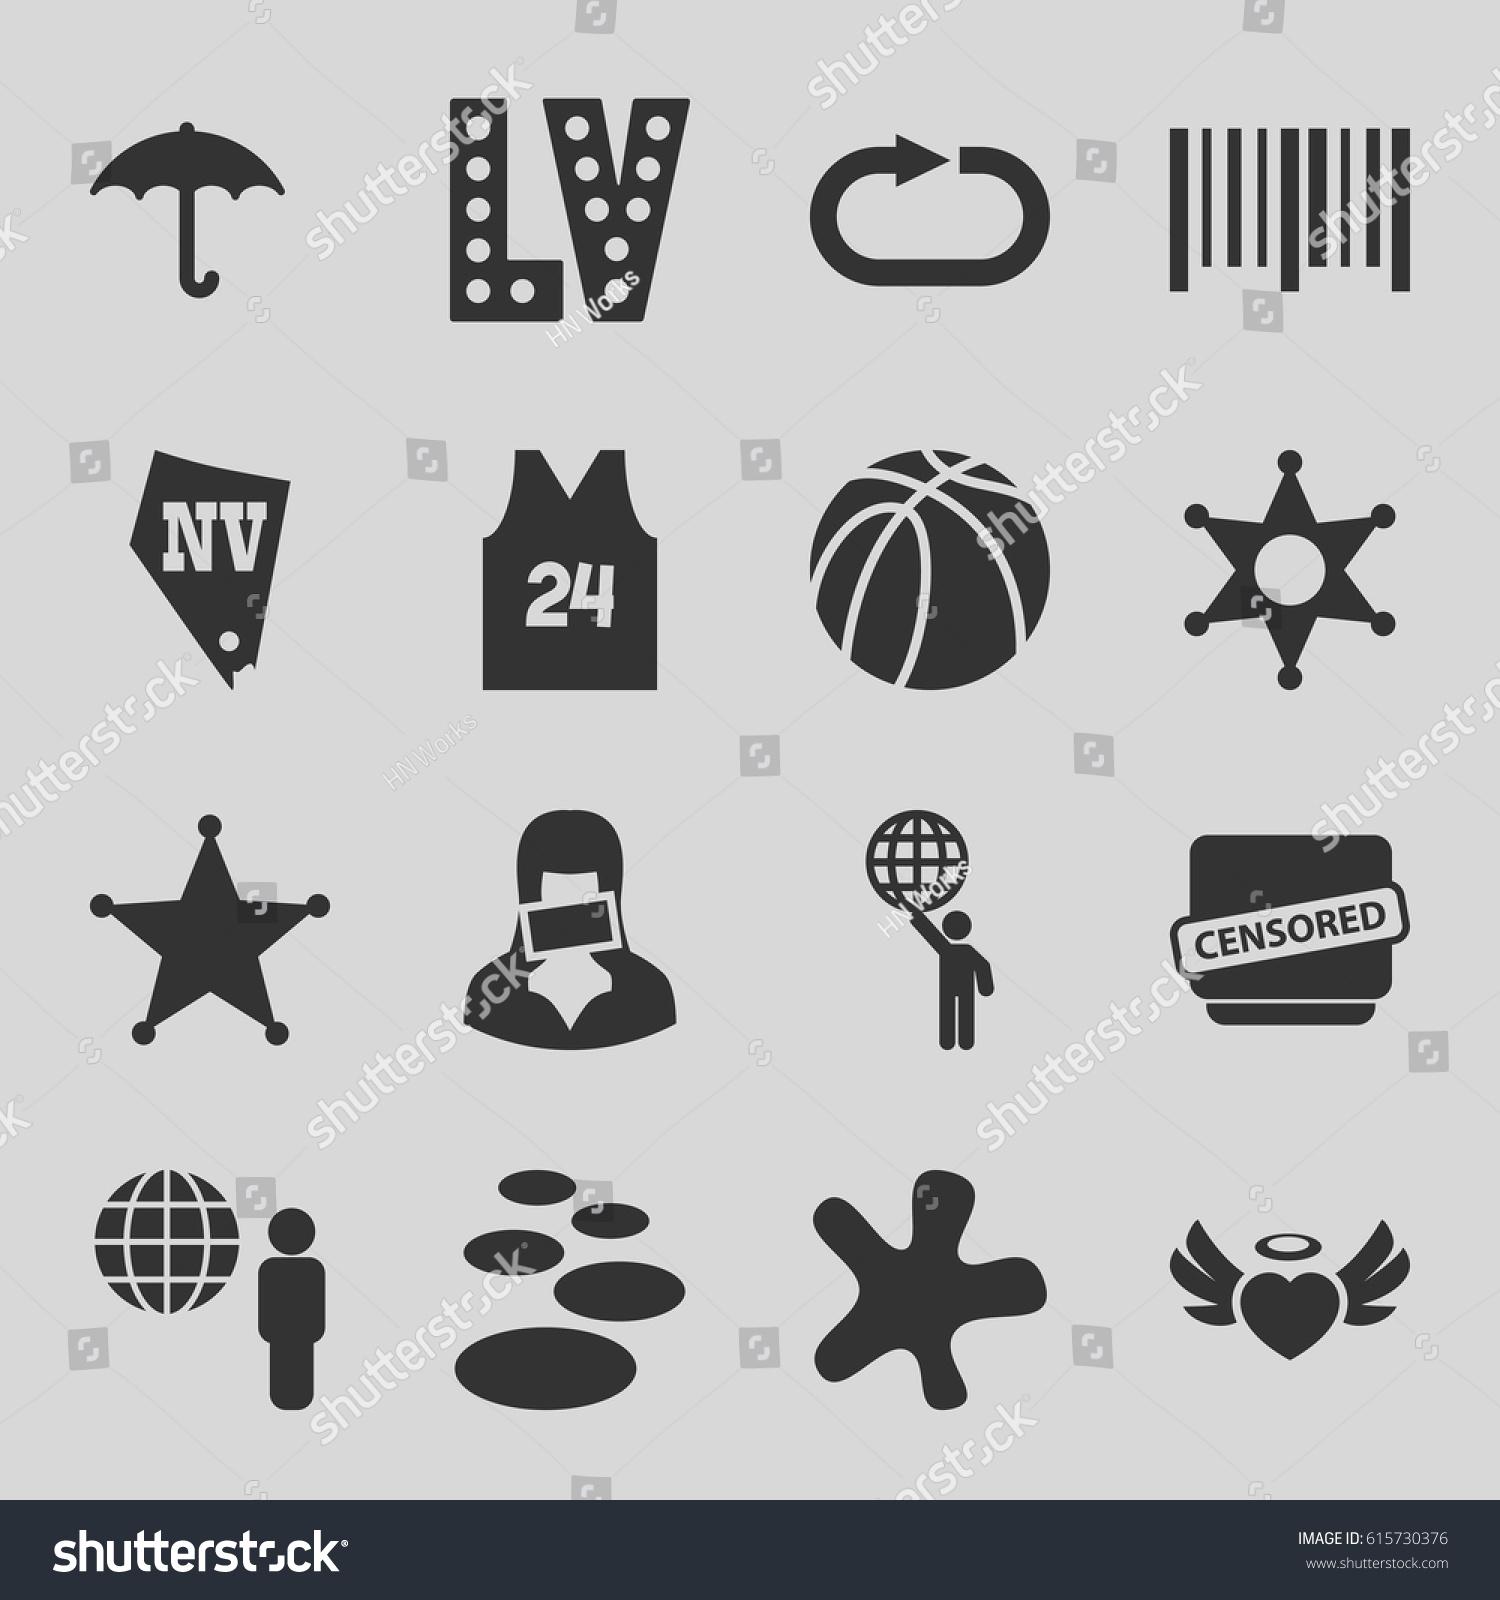 Grunge icons set set 16 grunge stock vector 615730376 shutterstock grunge icons set set of 16 grunge filled icons such as vegas splash buycottarizona Choice Image